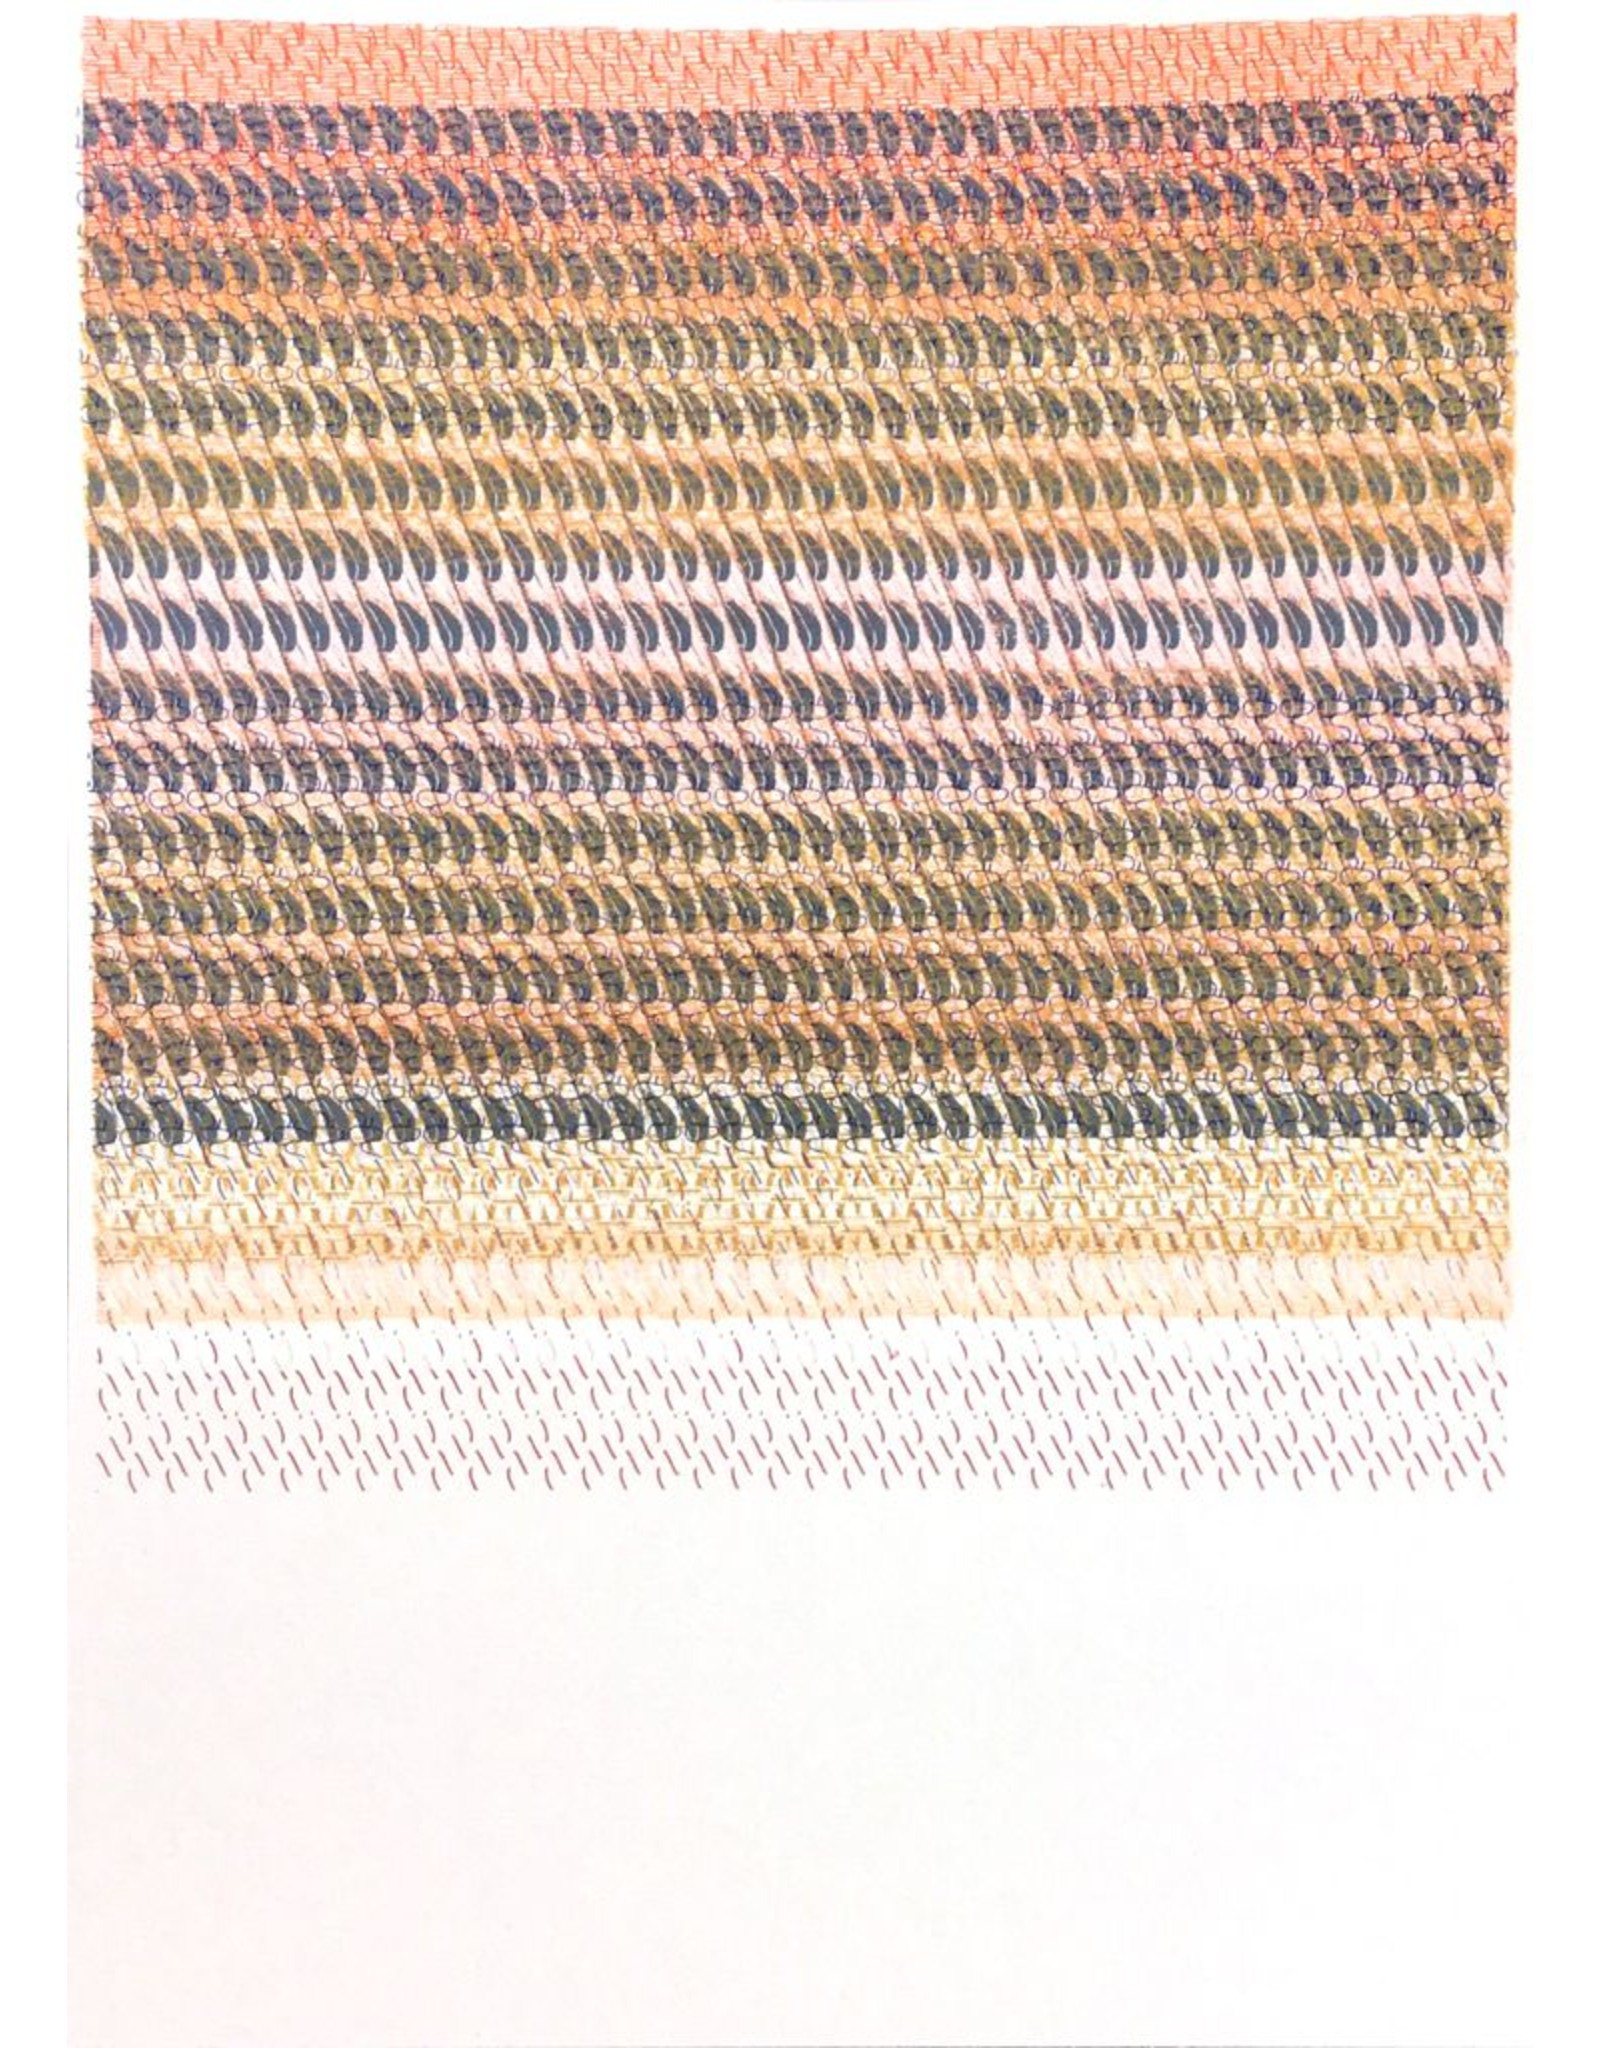 Pichon, Ilana Think: Monotype #117 (125)